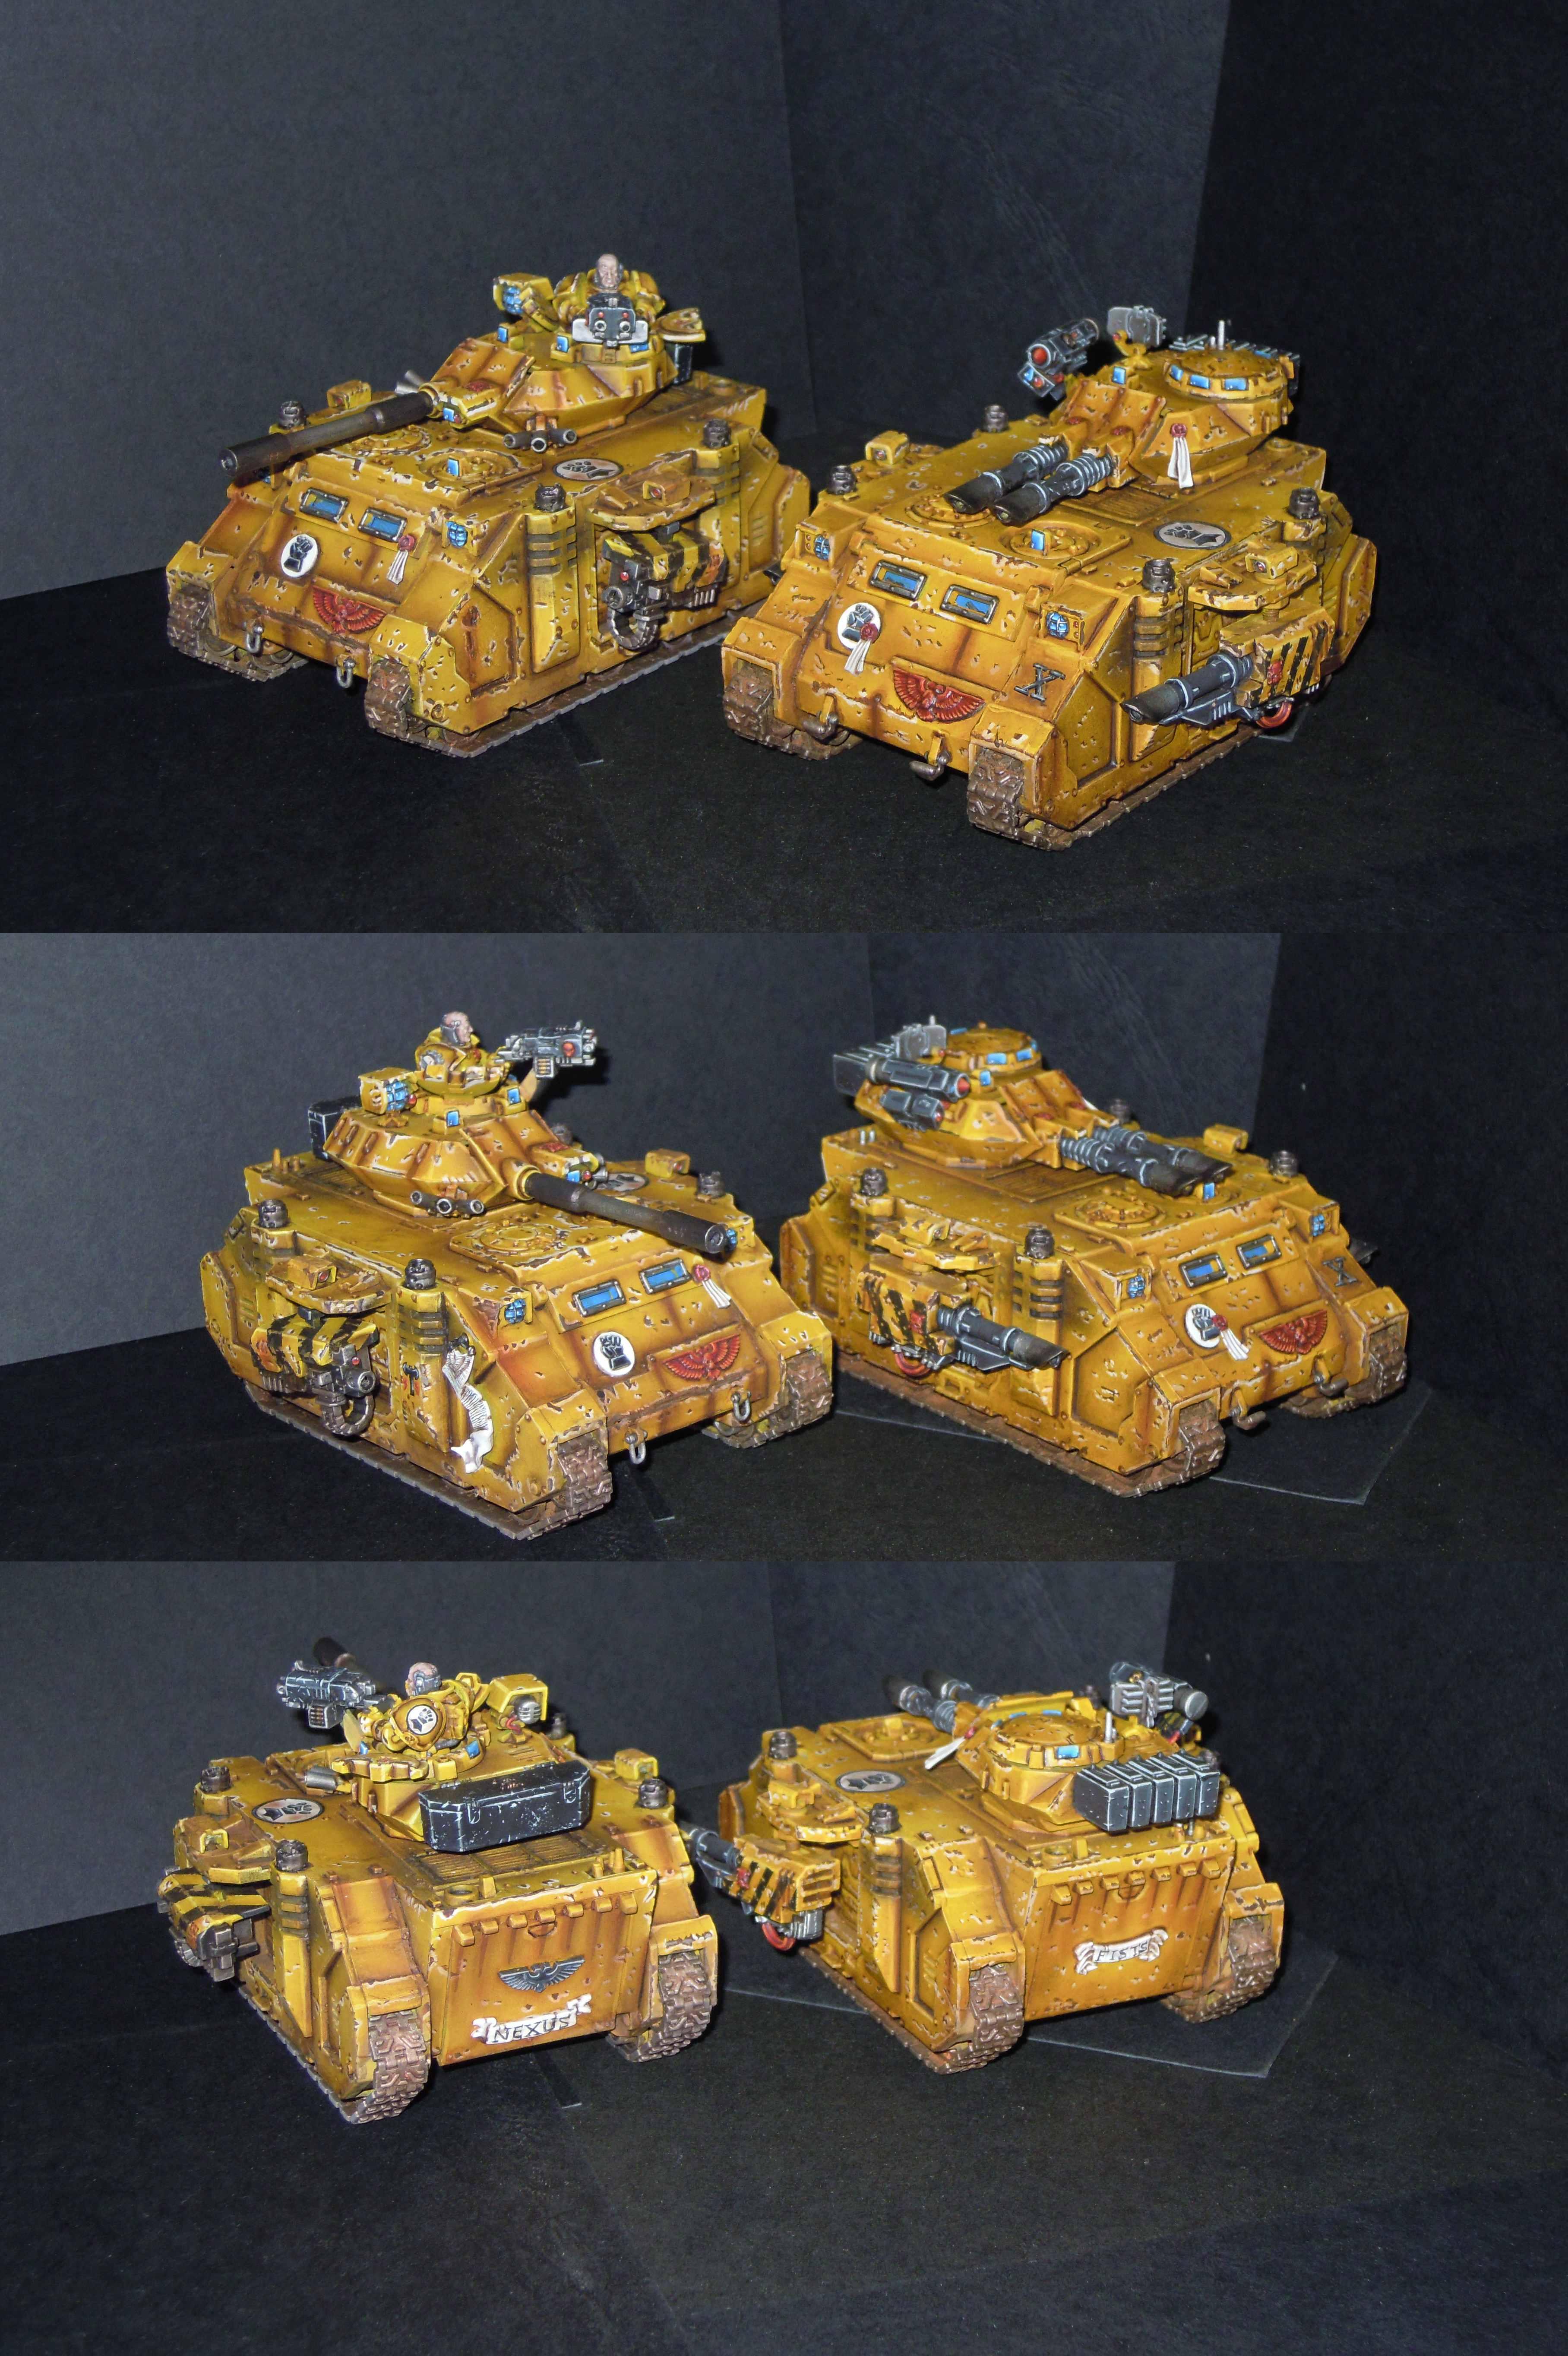 Dorn, Games Workshop, Imperial Fists, Imperium, Magli Imperiali, Oberon, Predator, Rhino, Space Marines, Vindicator, W40k, Warhammer 40,000